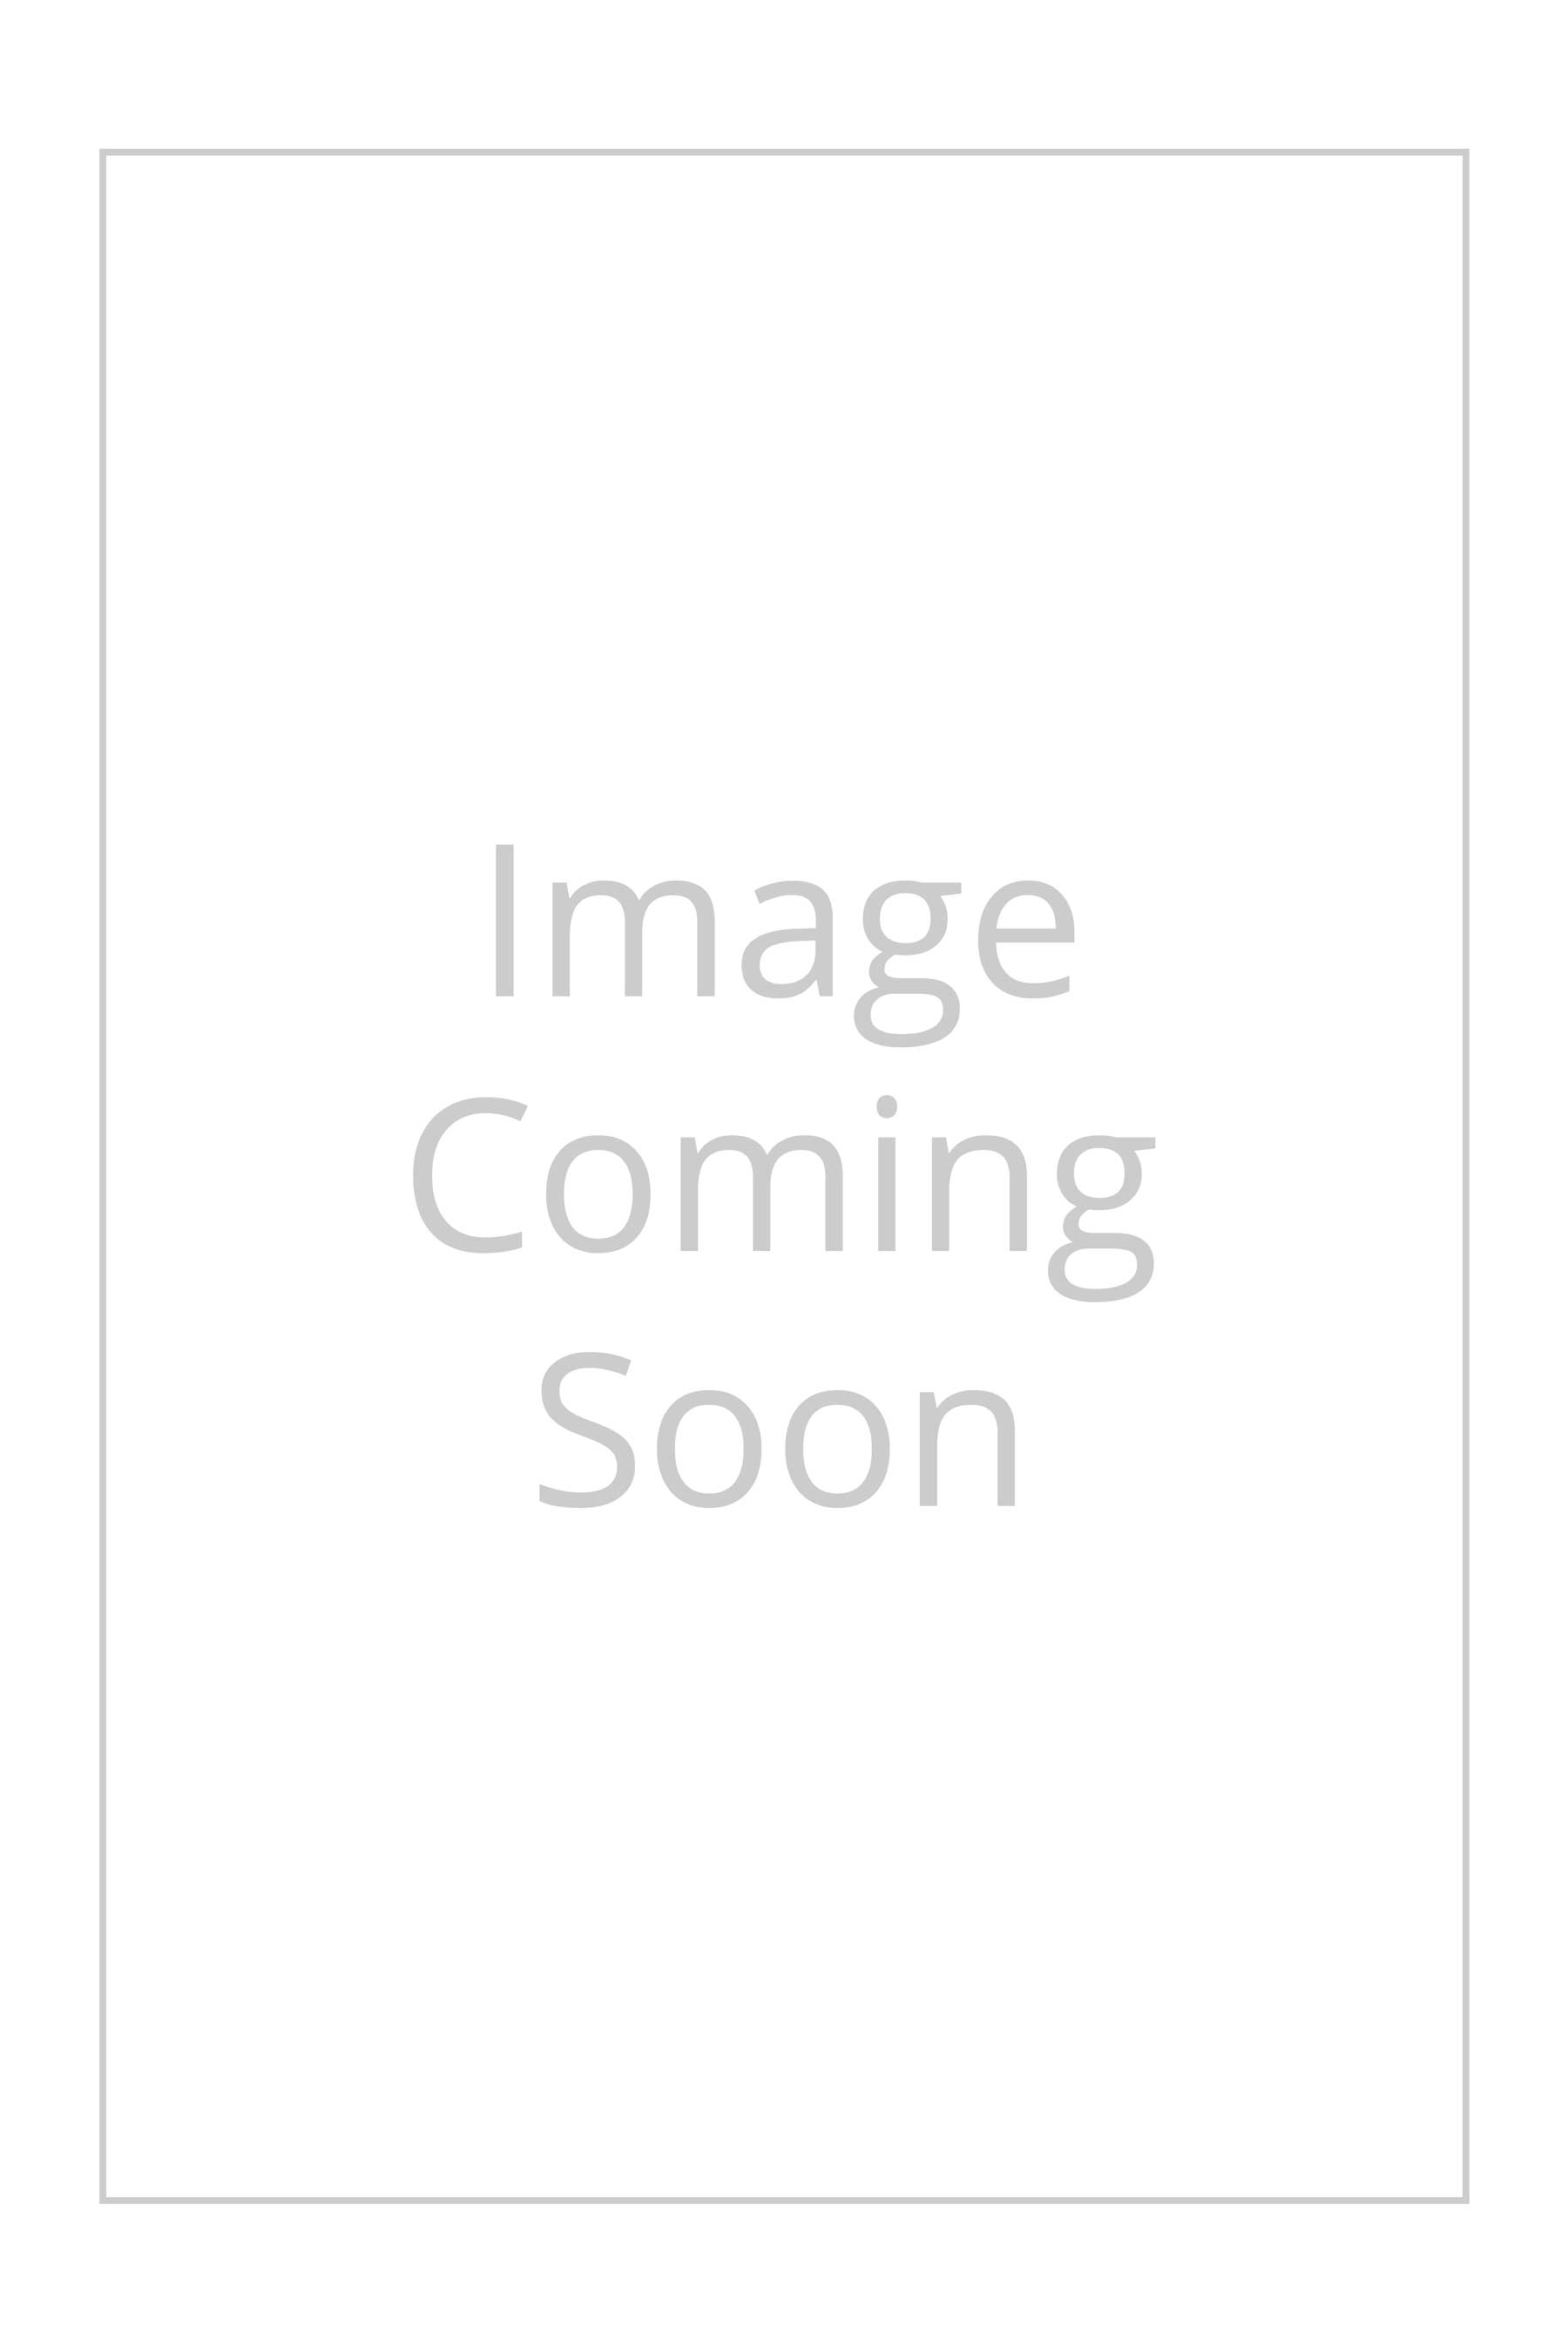 St. John Fuchsia & Black Knit Jacket with 3/4 Length Sleeves